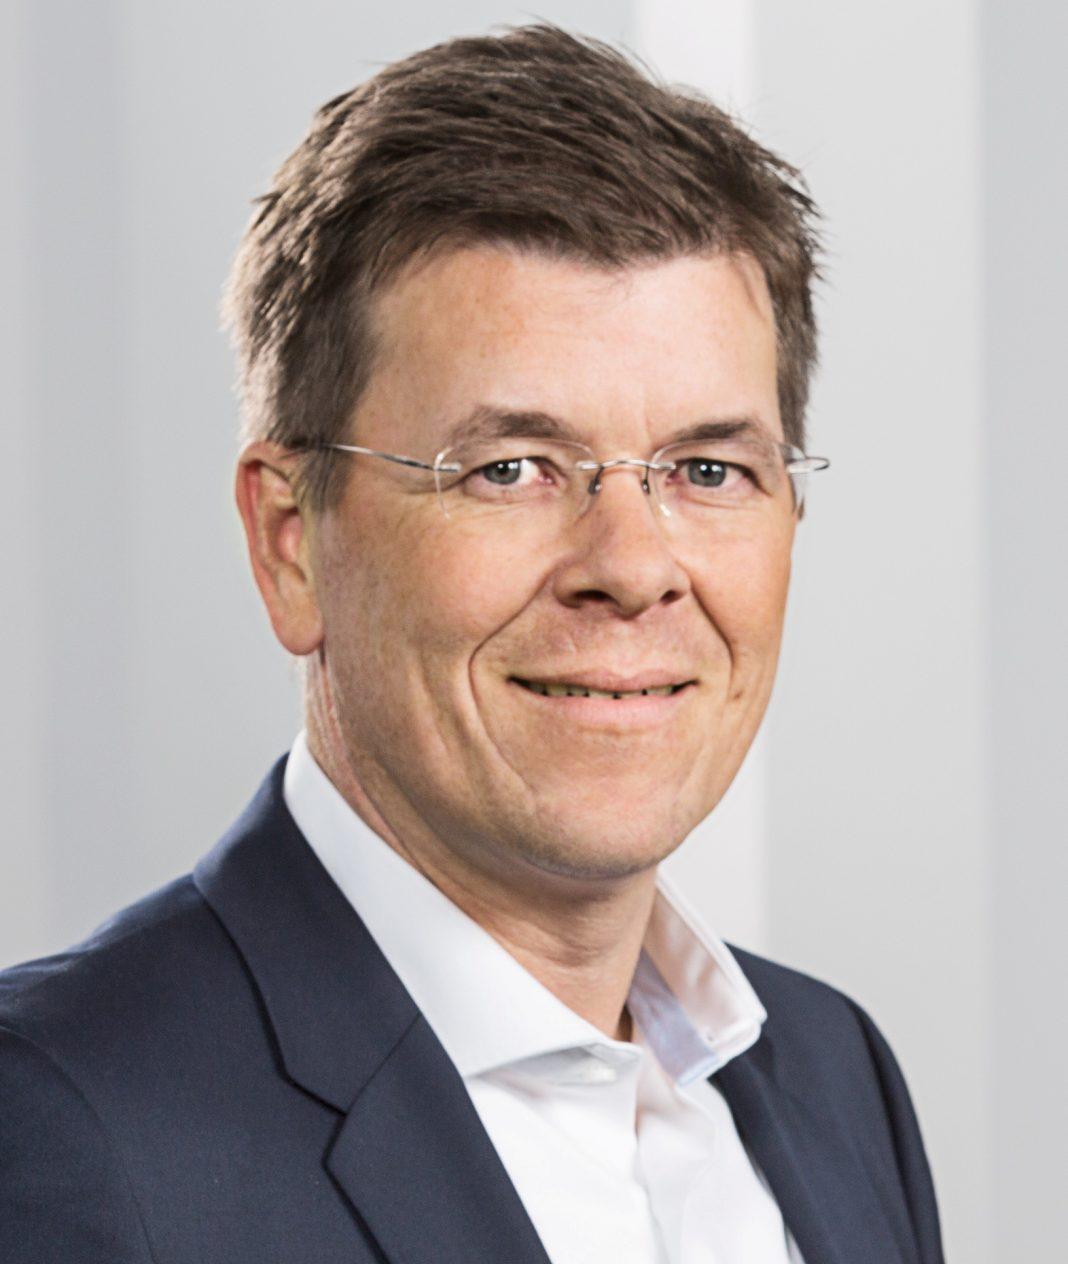 Christian Sailer, Weltbild GmbH & Co. KGaA